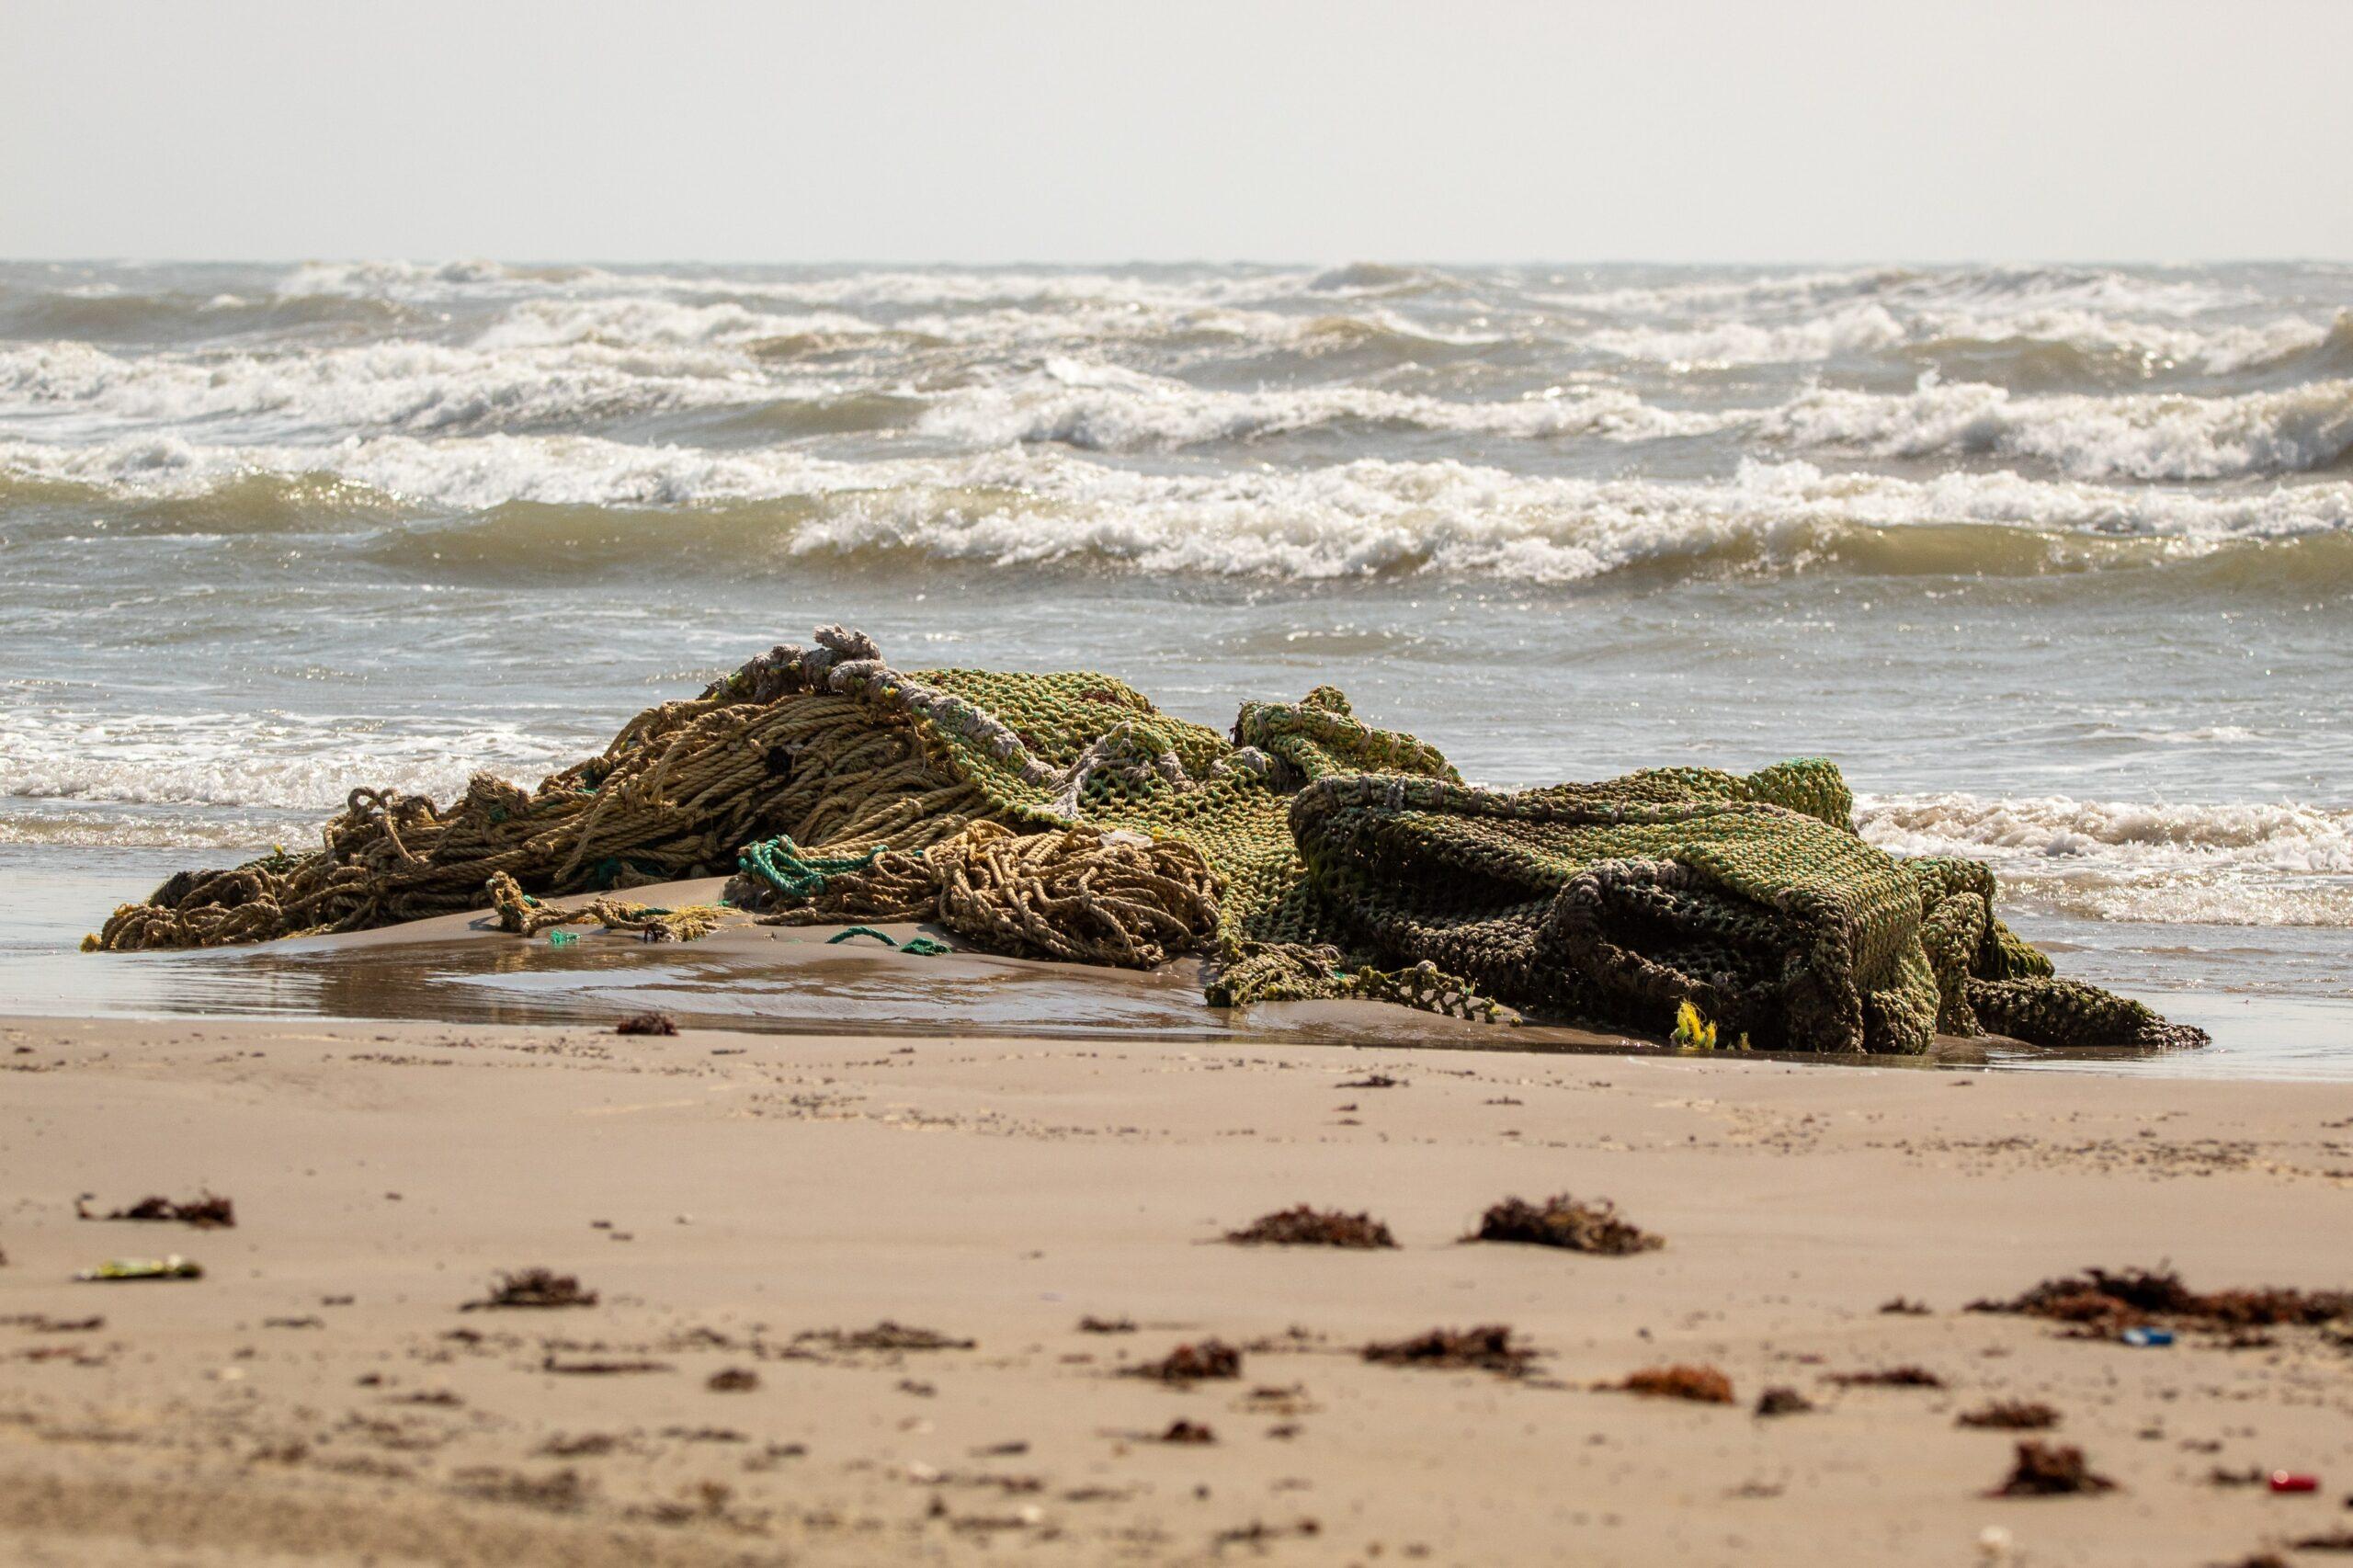 fiskenet paa stranden, dragor skincare